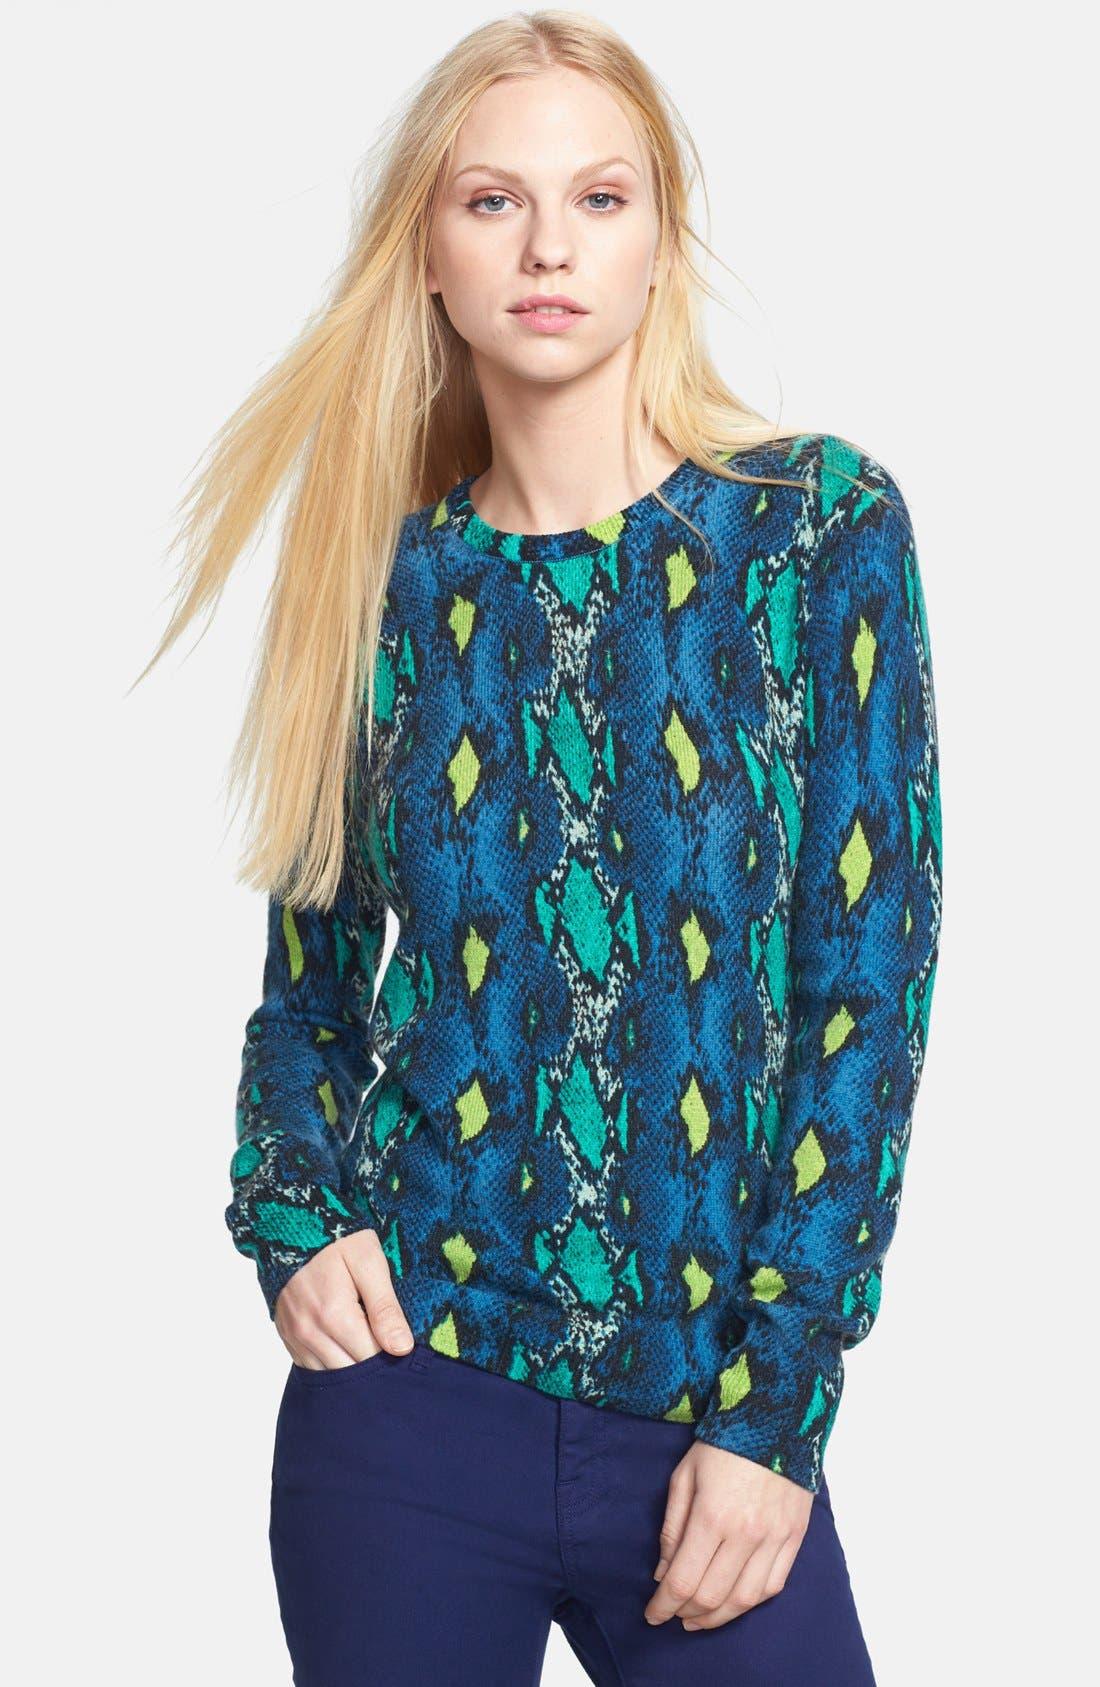 Main Image - Equipment 'Sloane' Snake Pattern Cashmere Sweater